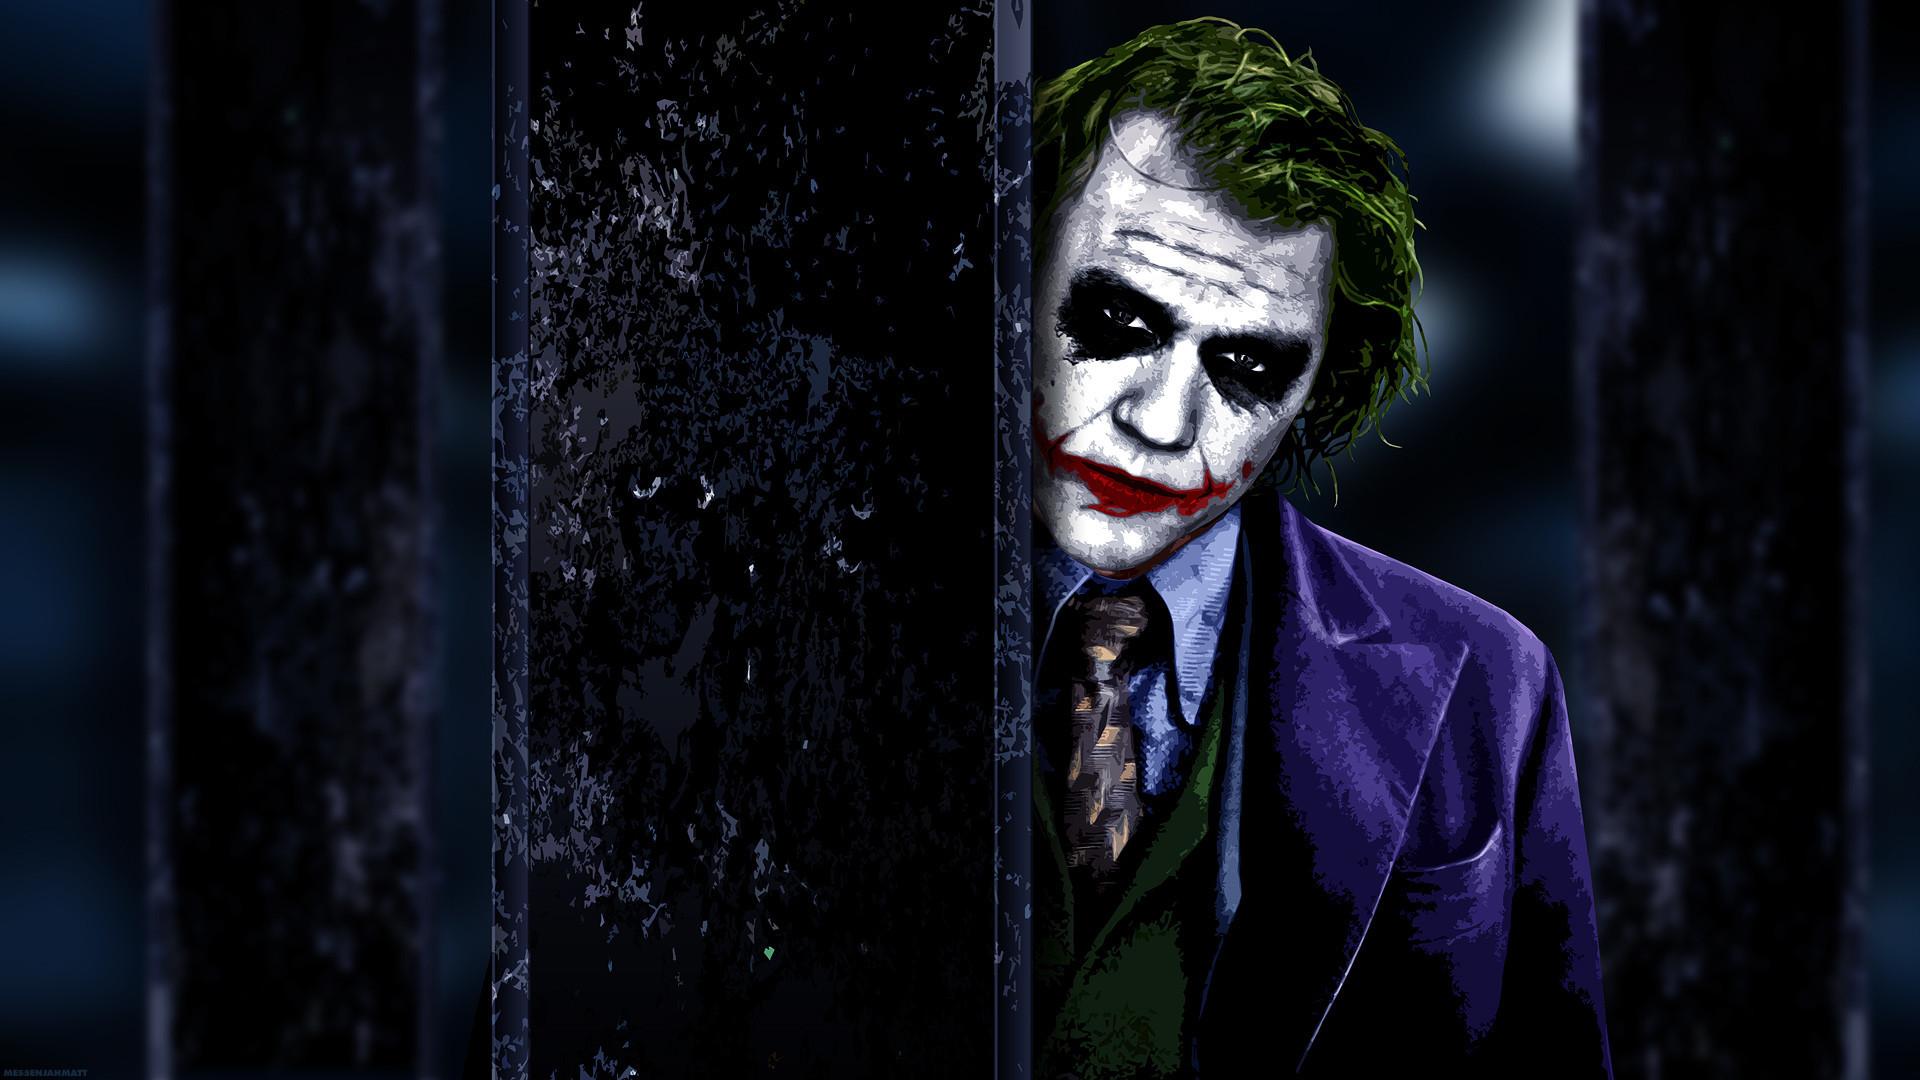 1920x1080 Heath Ledger Joker Wallpaper 74 Images Download Barbara Palvin